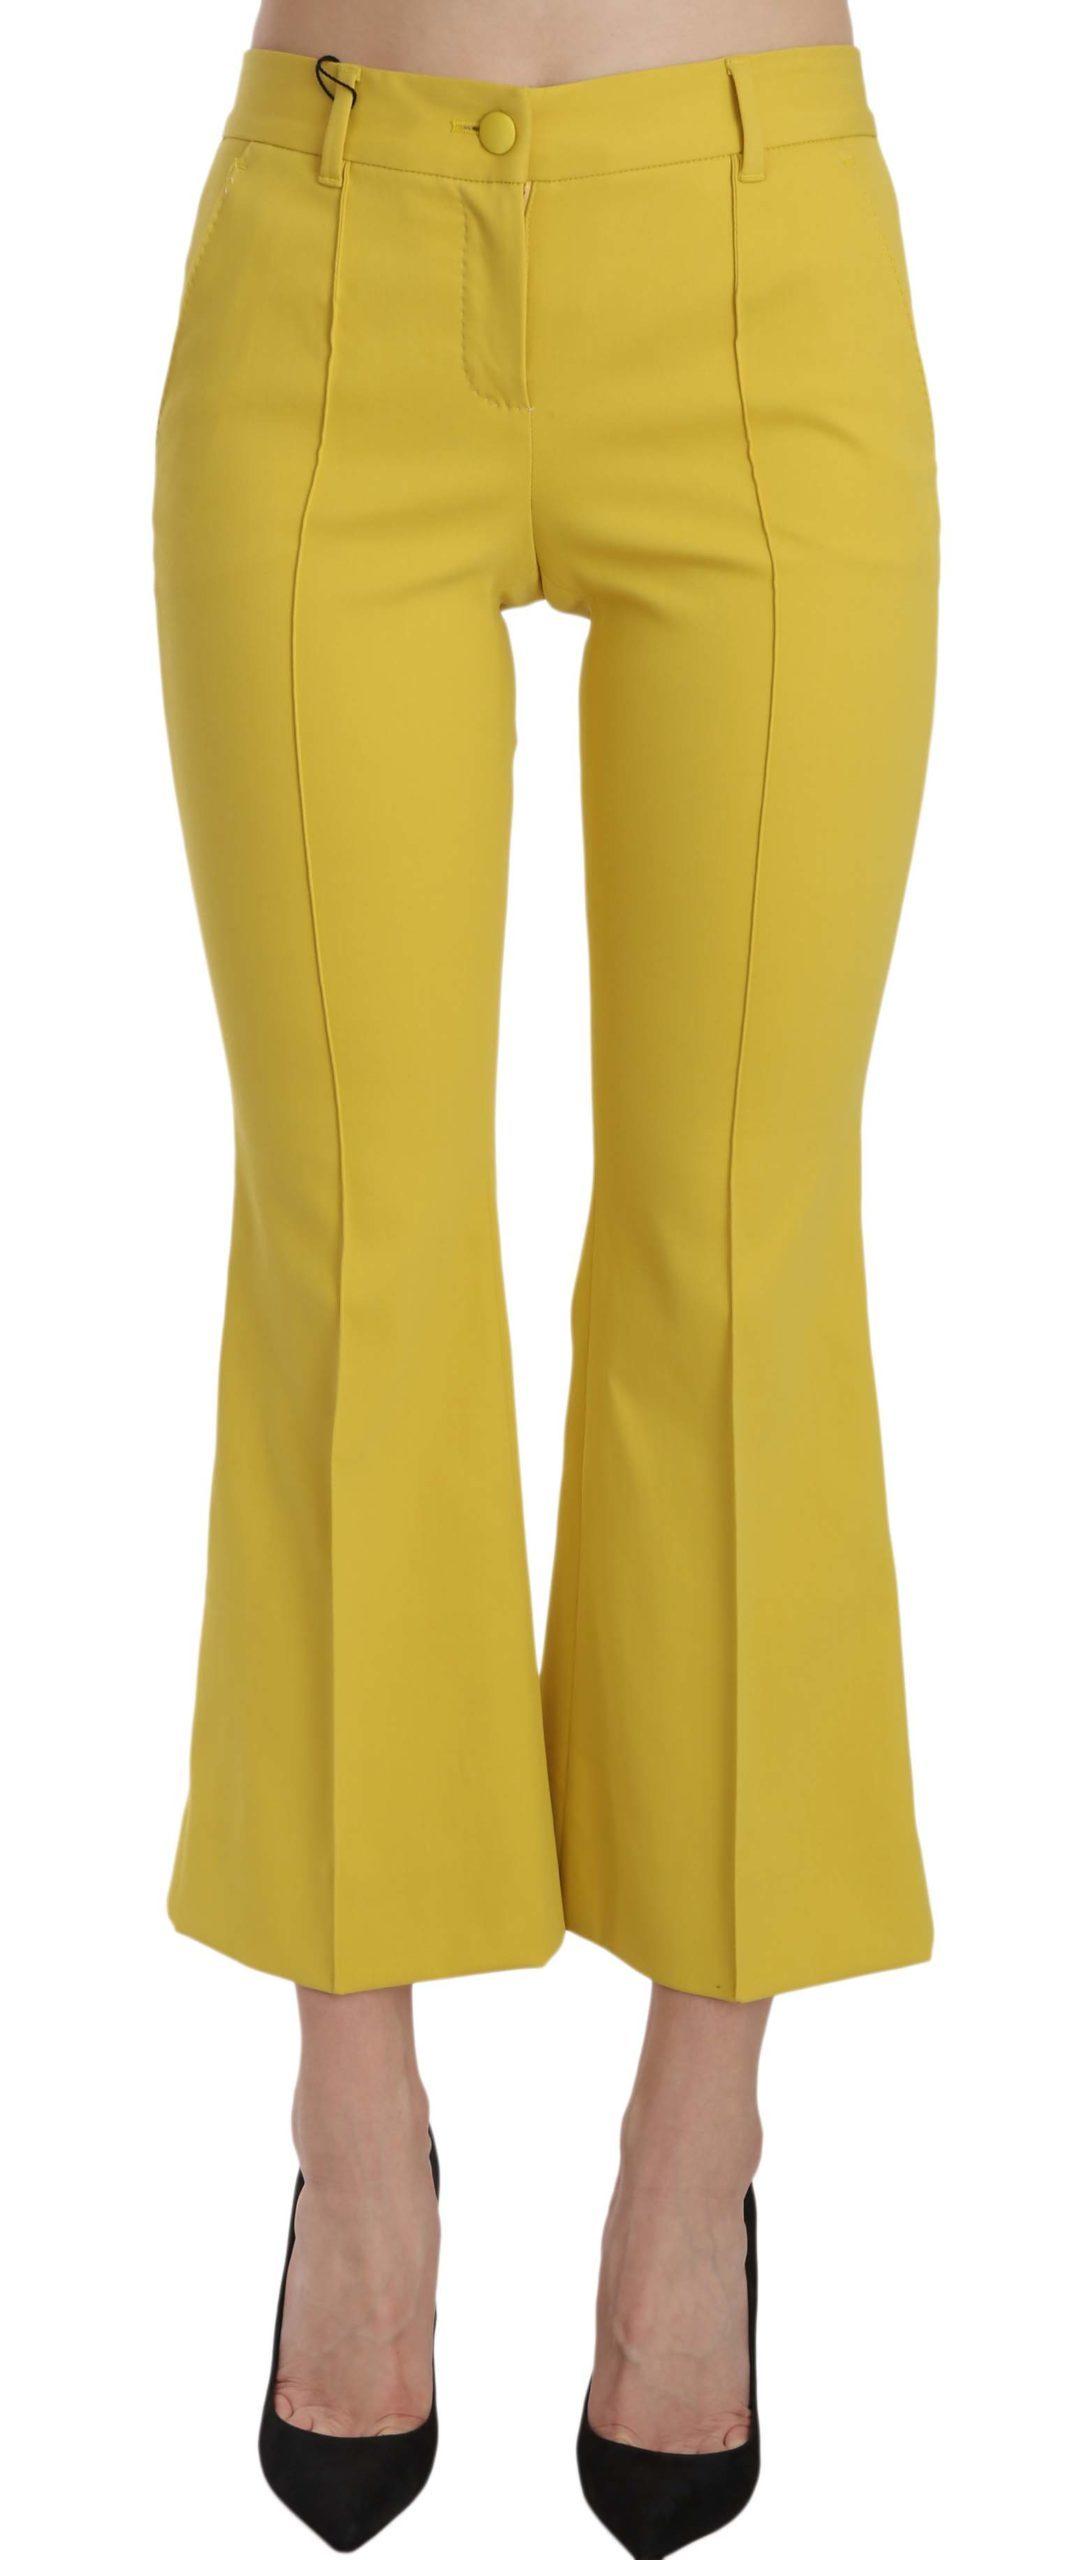 Dolce & Gabbana Women's Flared Bootcut Capri Trousers Yellow PAN61191 - IT36 | XS